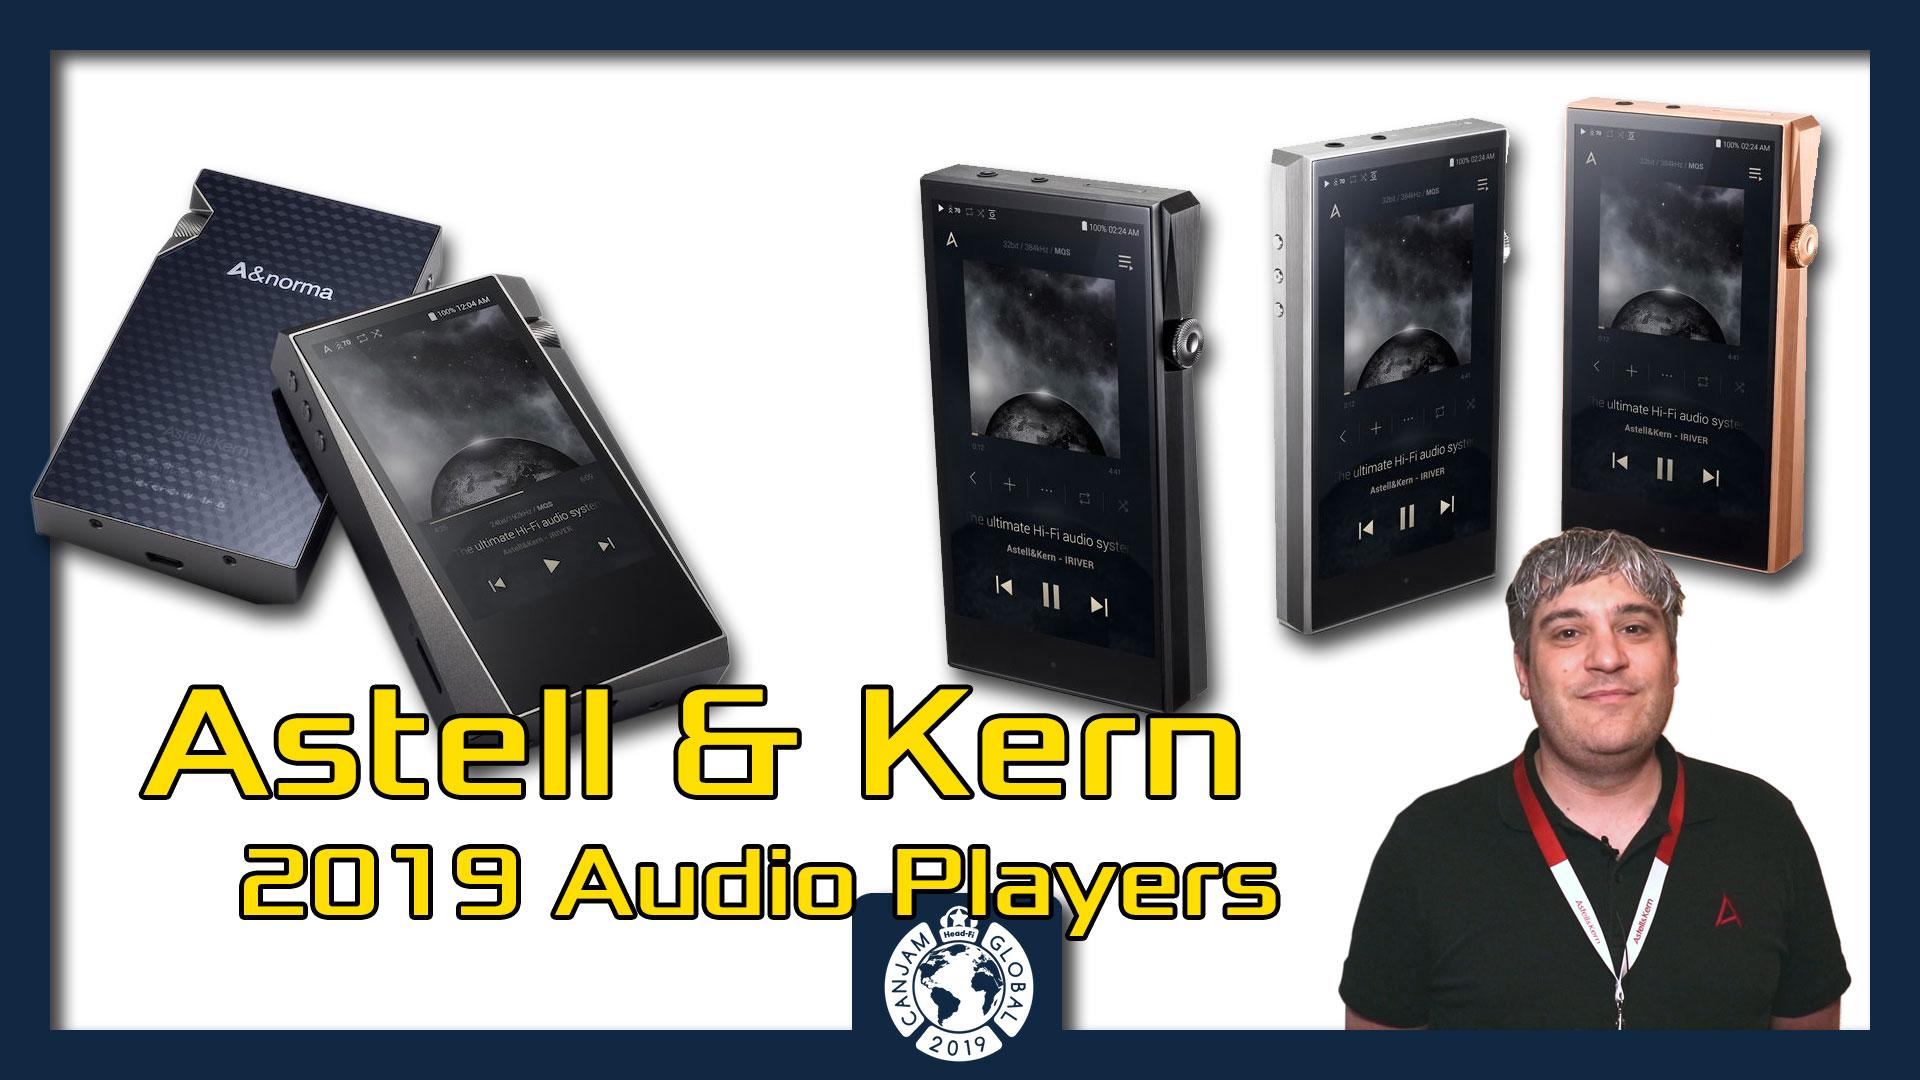 Astell & Kern 2019 Audio Players